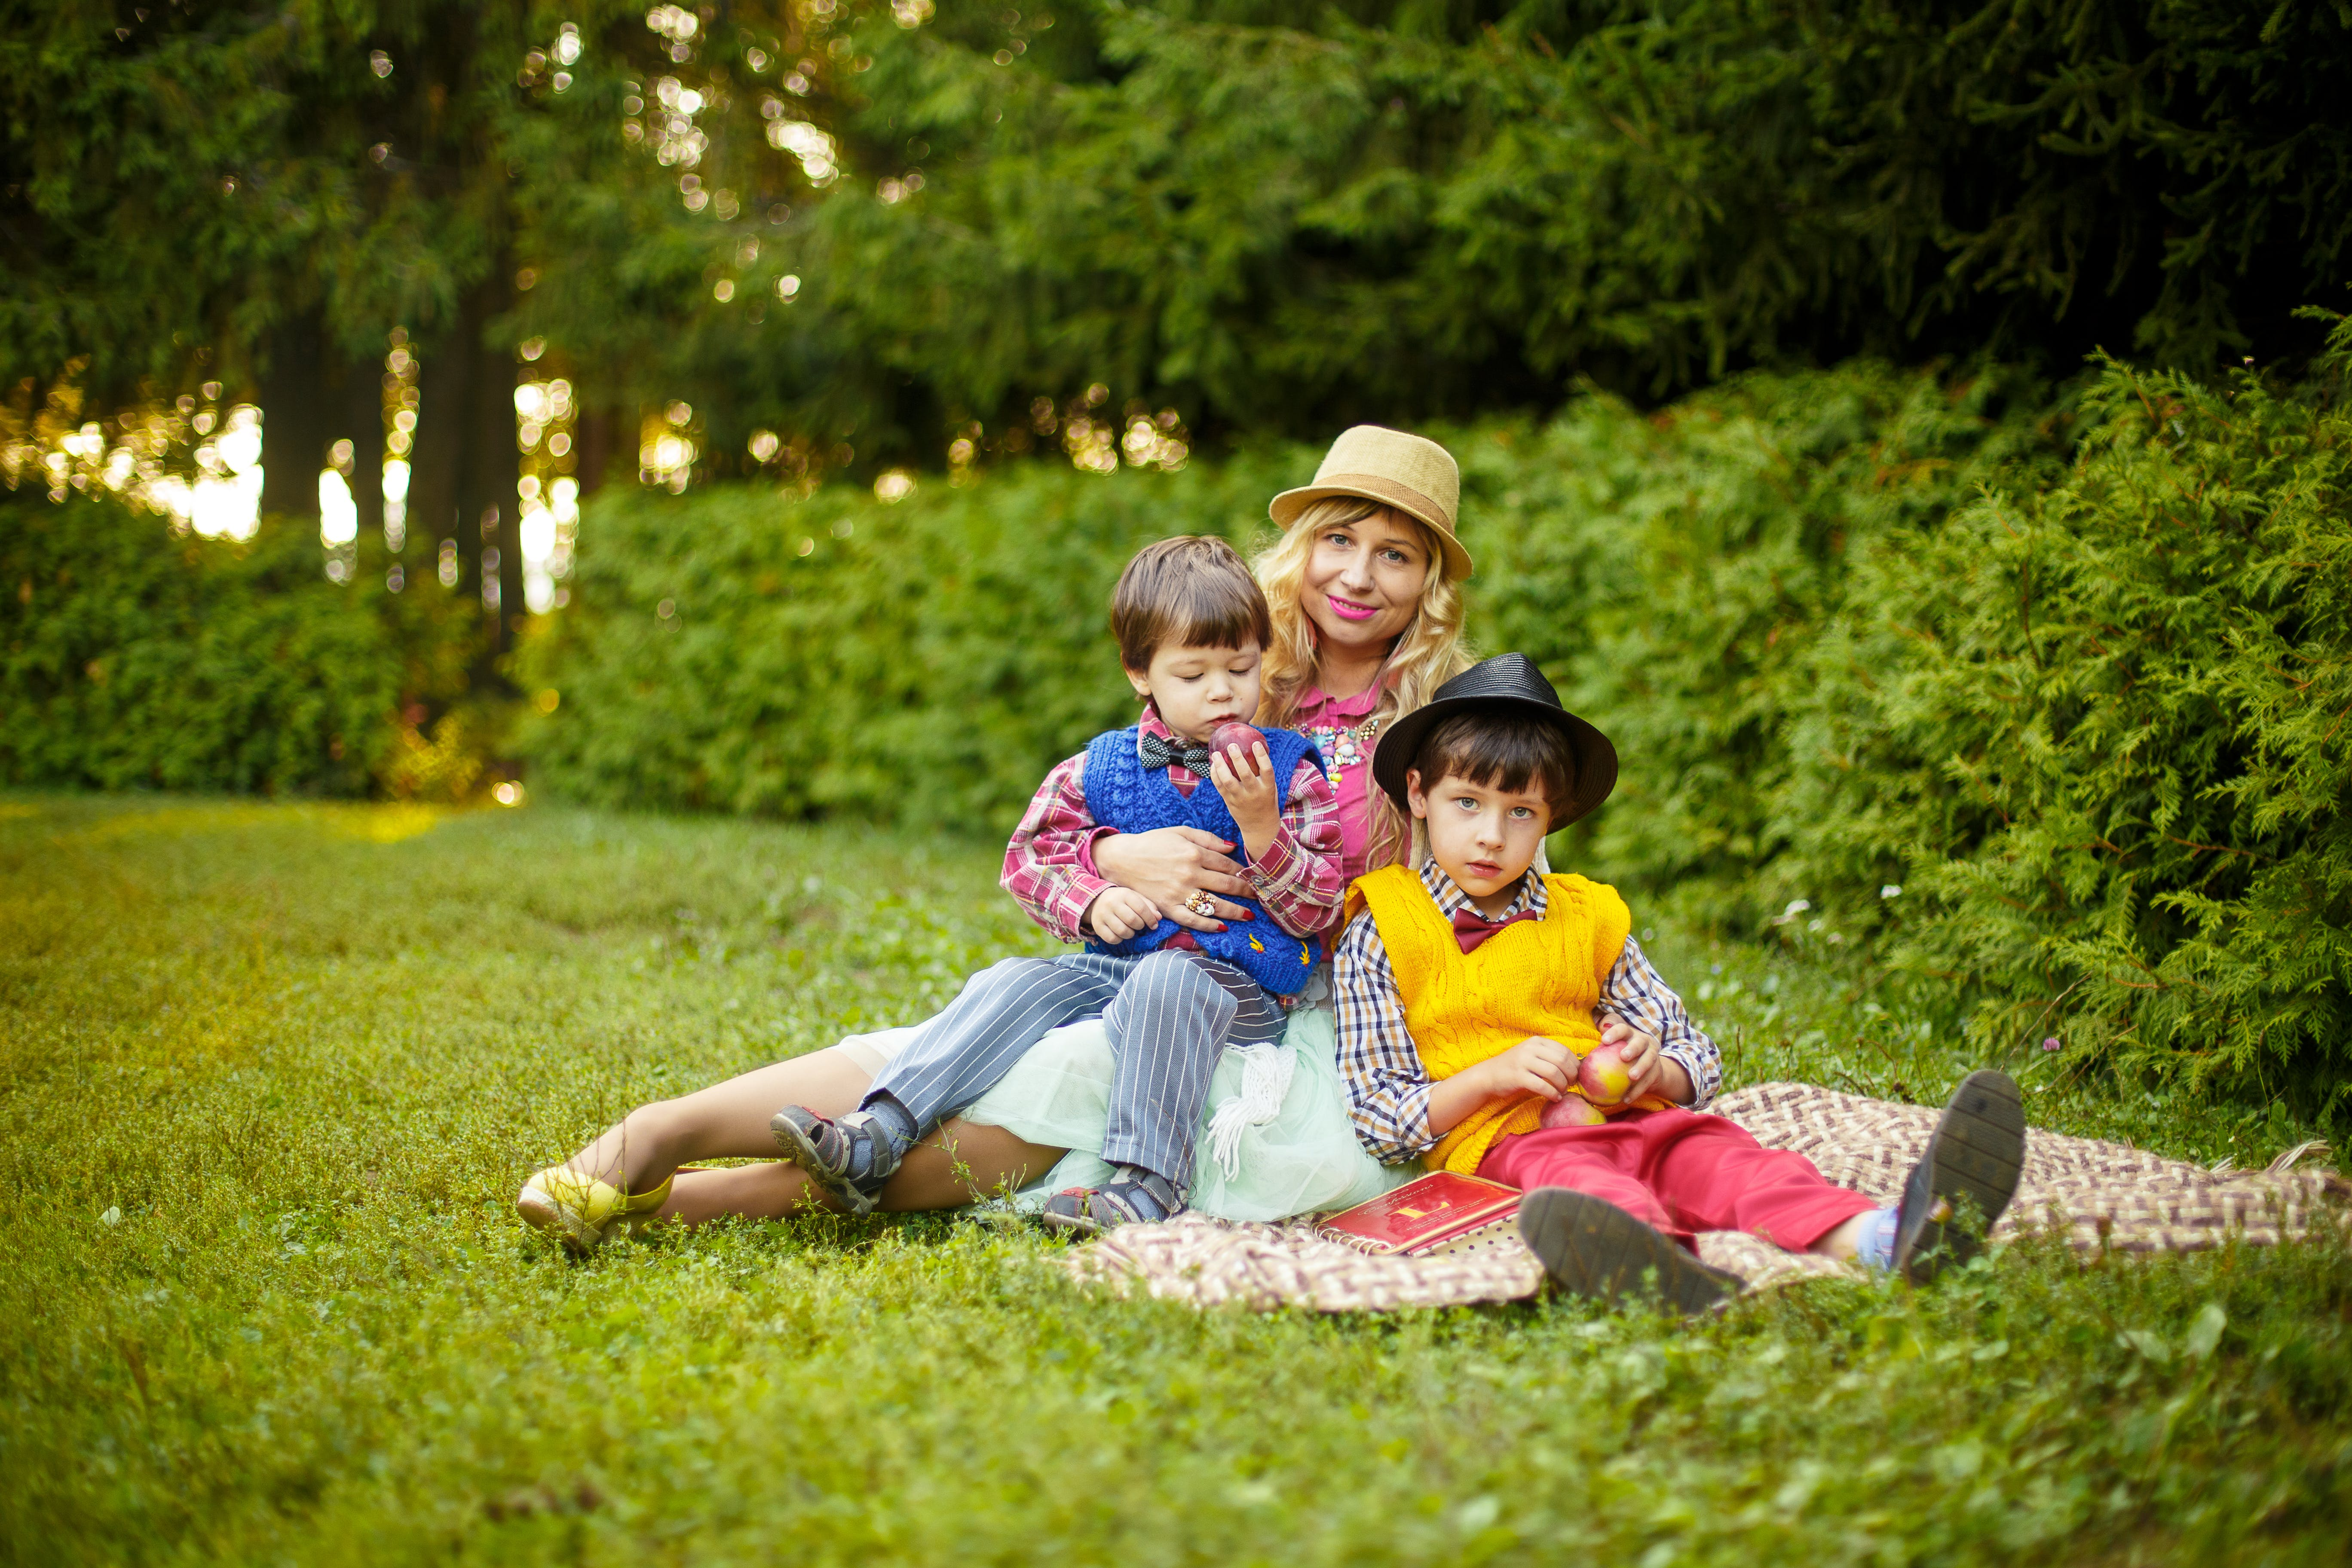 zu familie, fotoshooting, freizeit, freude